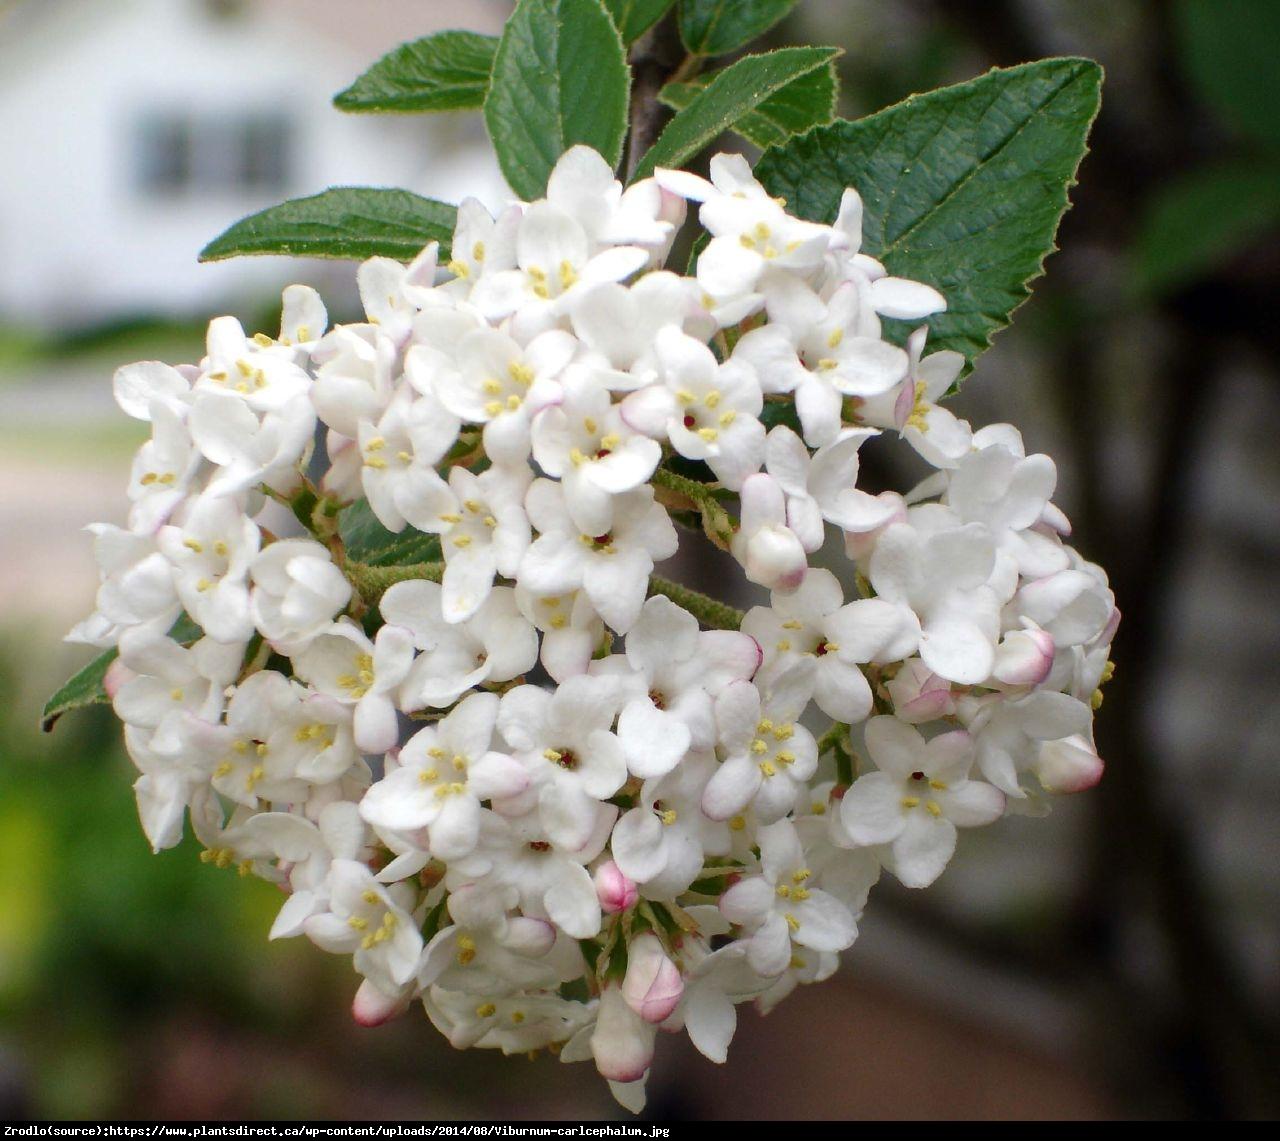 Kalina angielska - Viburnum carlcephalum